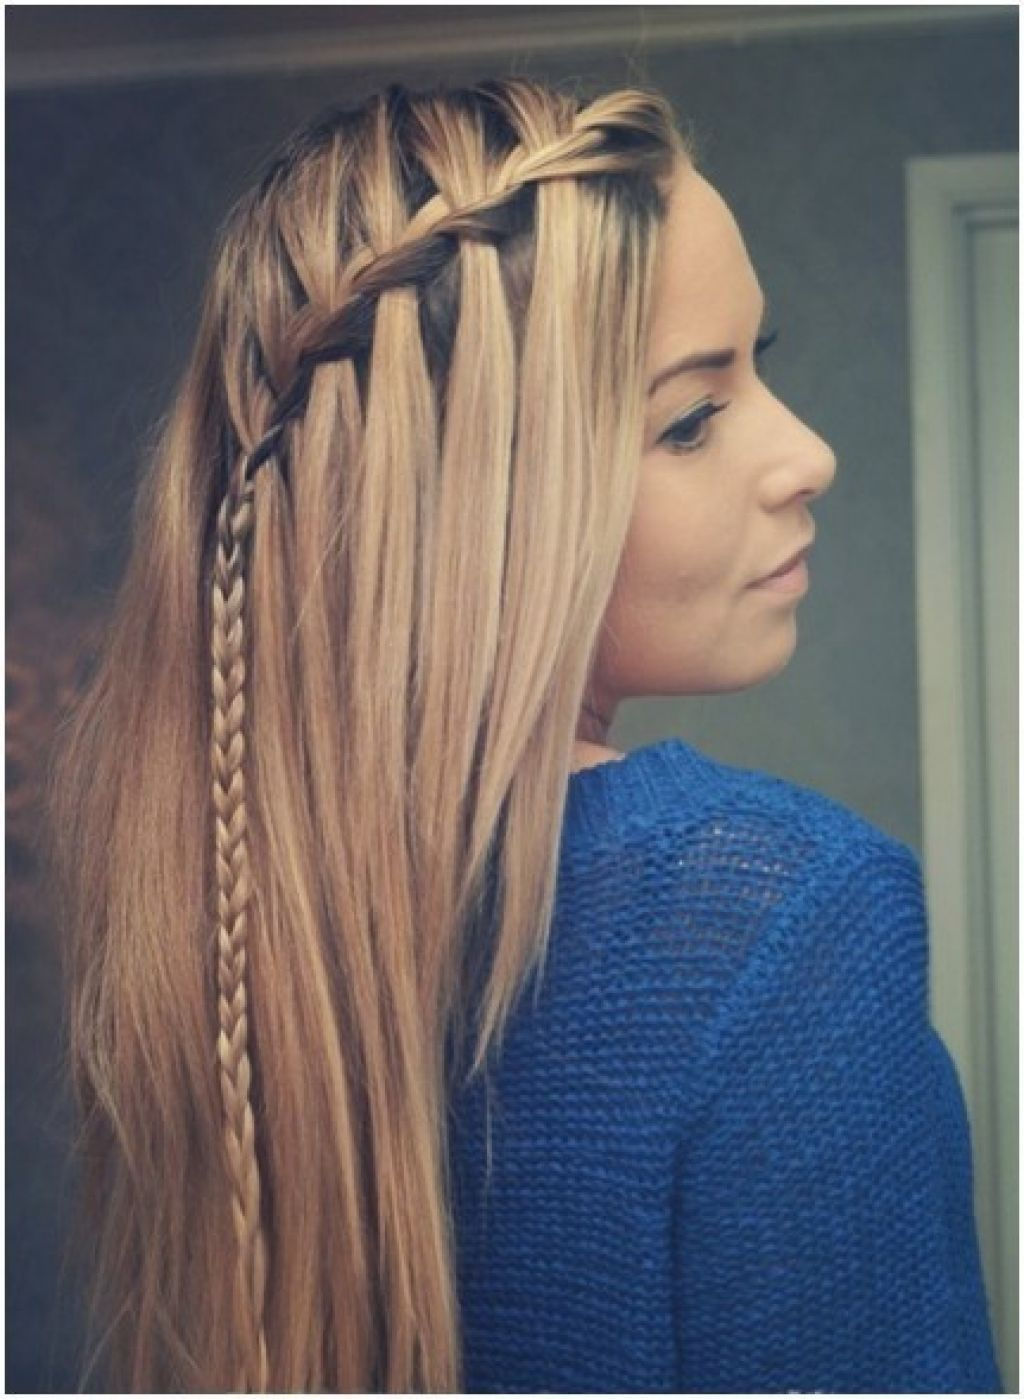 Surprising Straight Hair Simple Hairstyles And Long Hairstyles On Pinterest Short Hairstyles For Black Women Fulllsitofus